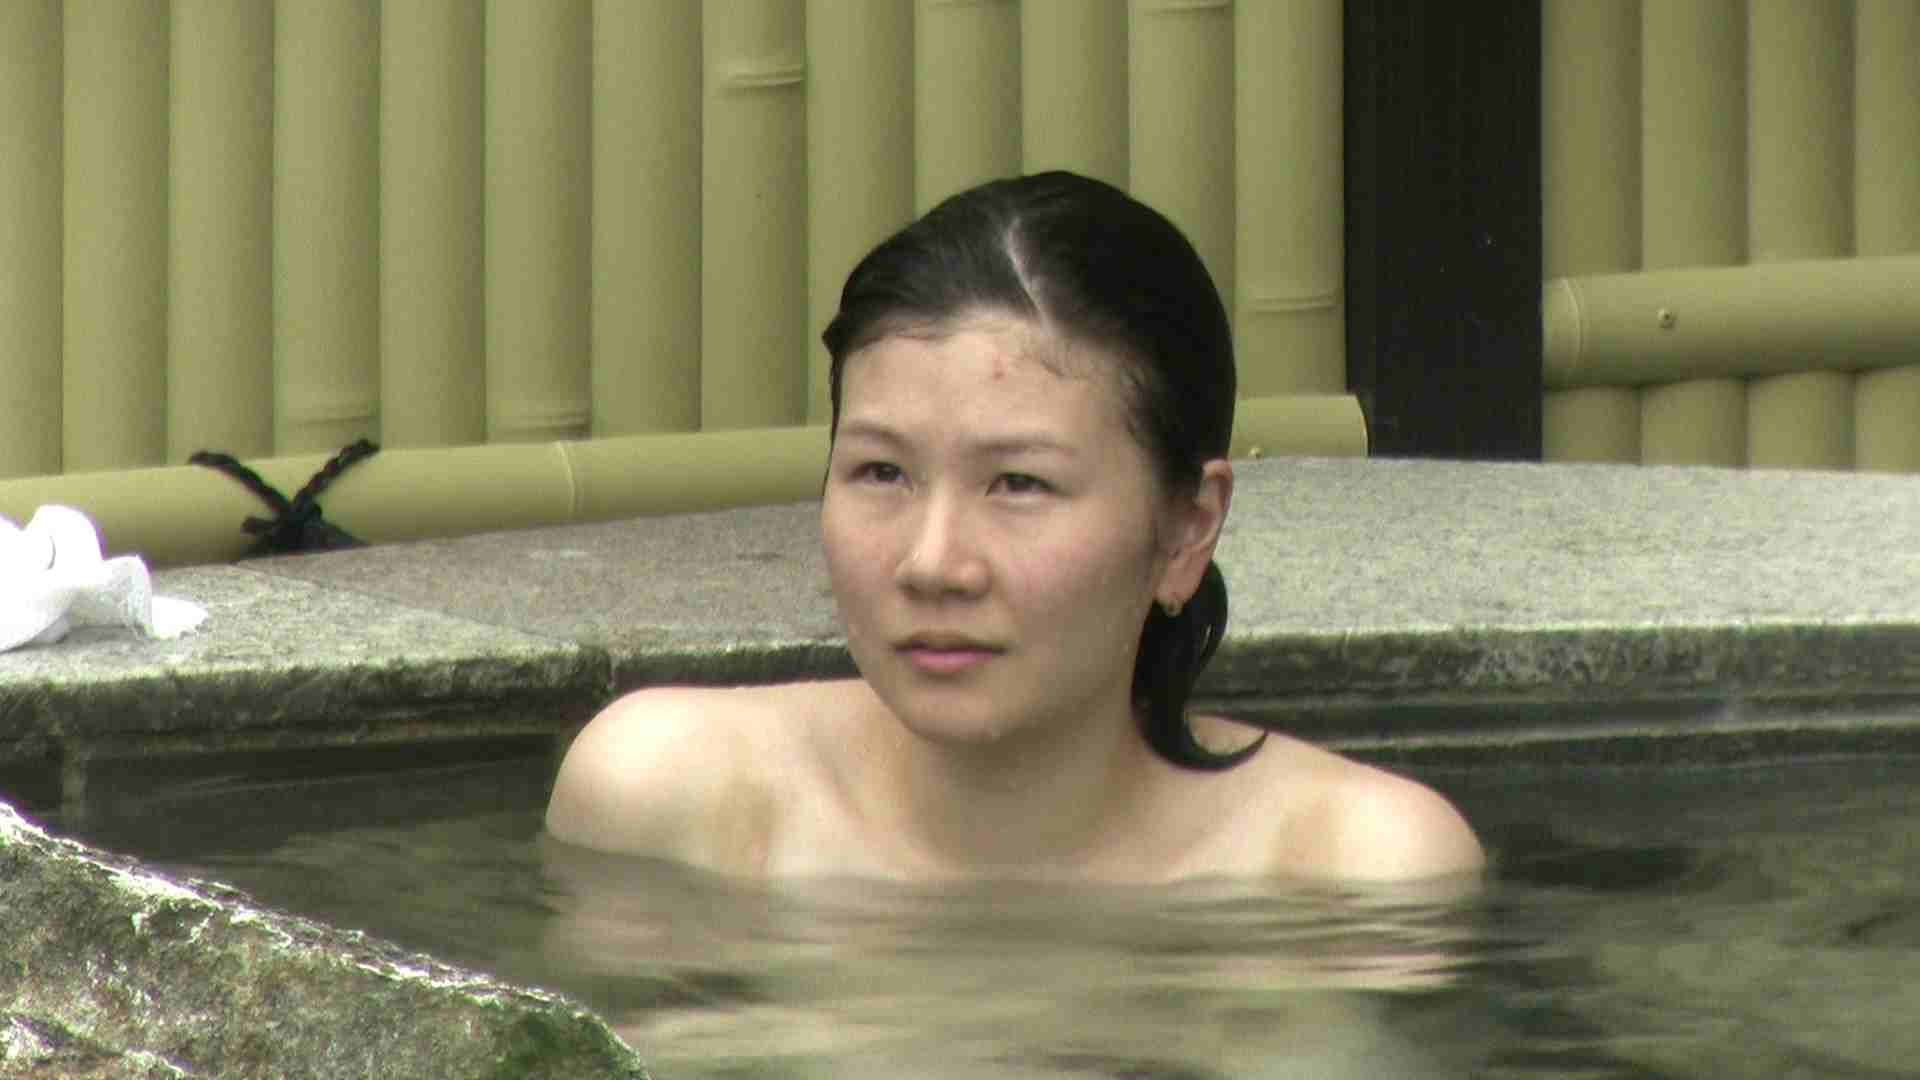 Aquaな露天風呂Vol.187 盗撮   HなOL  96pic 28